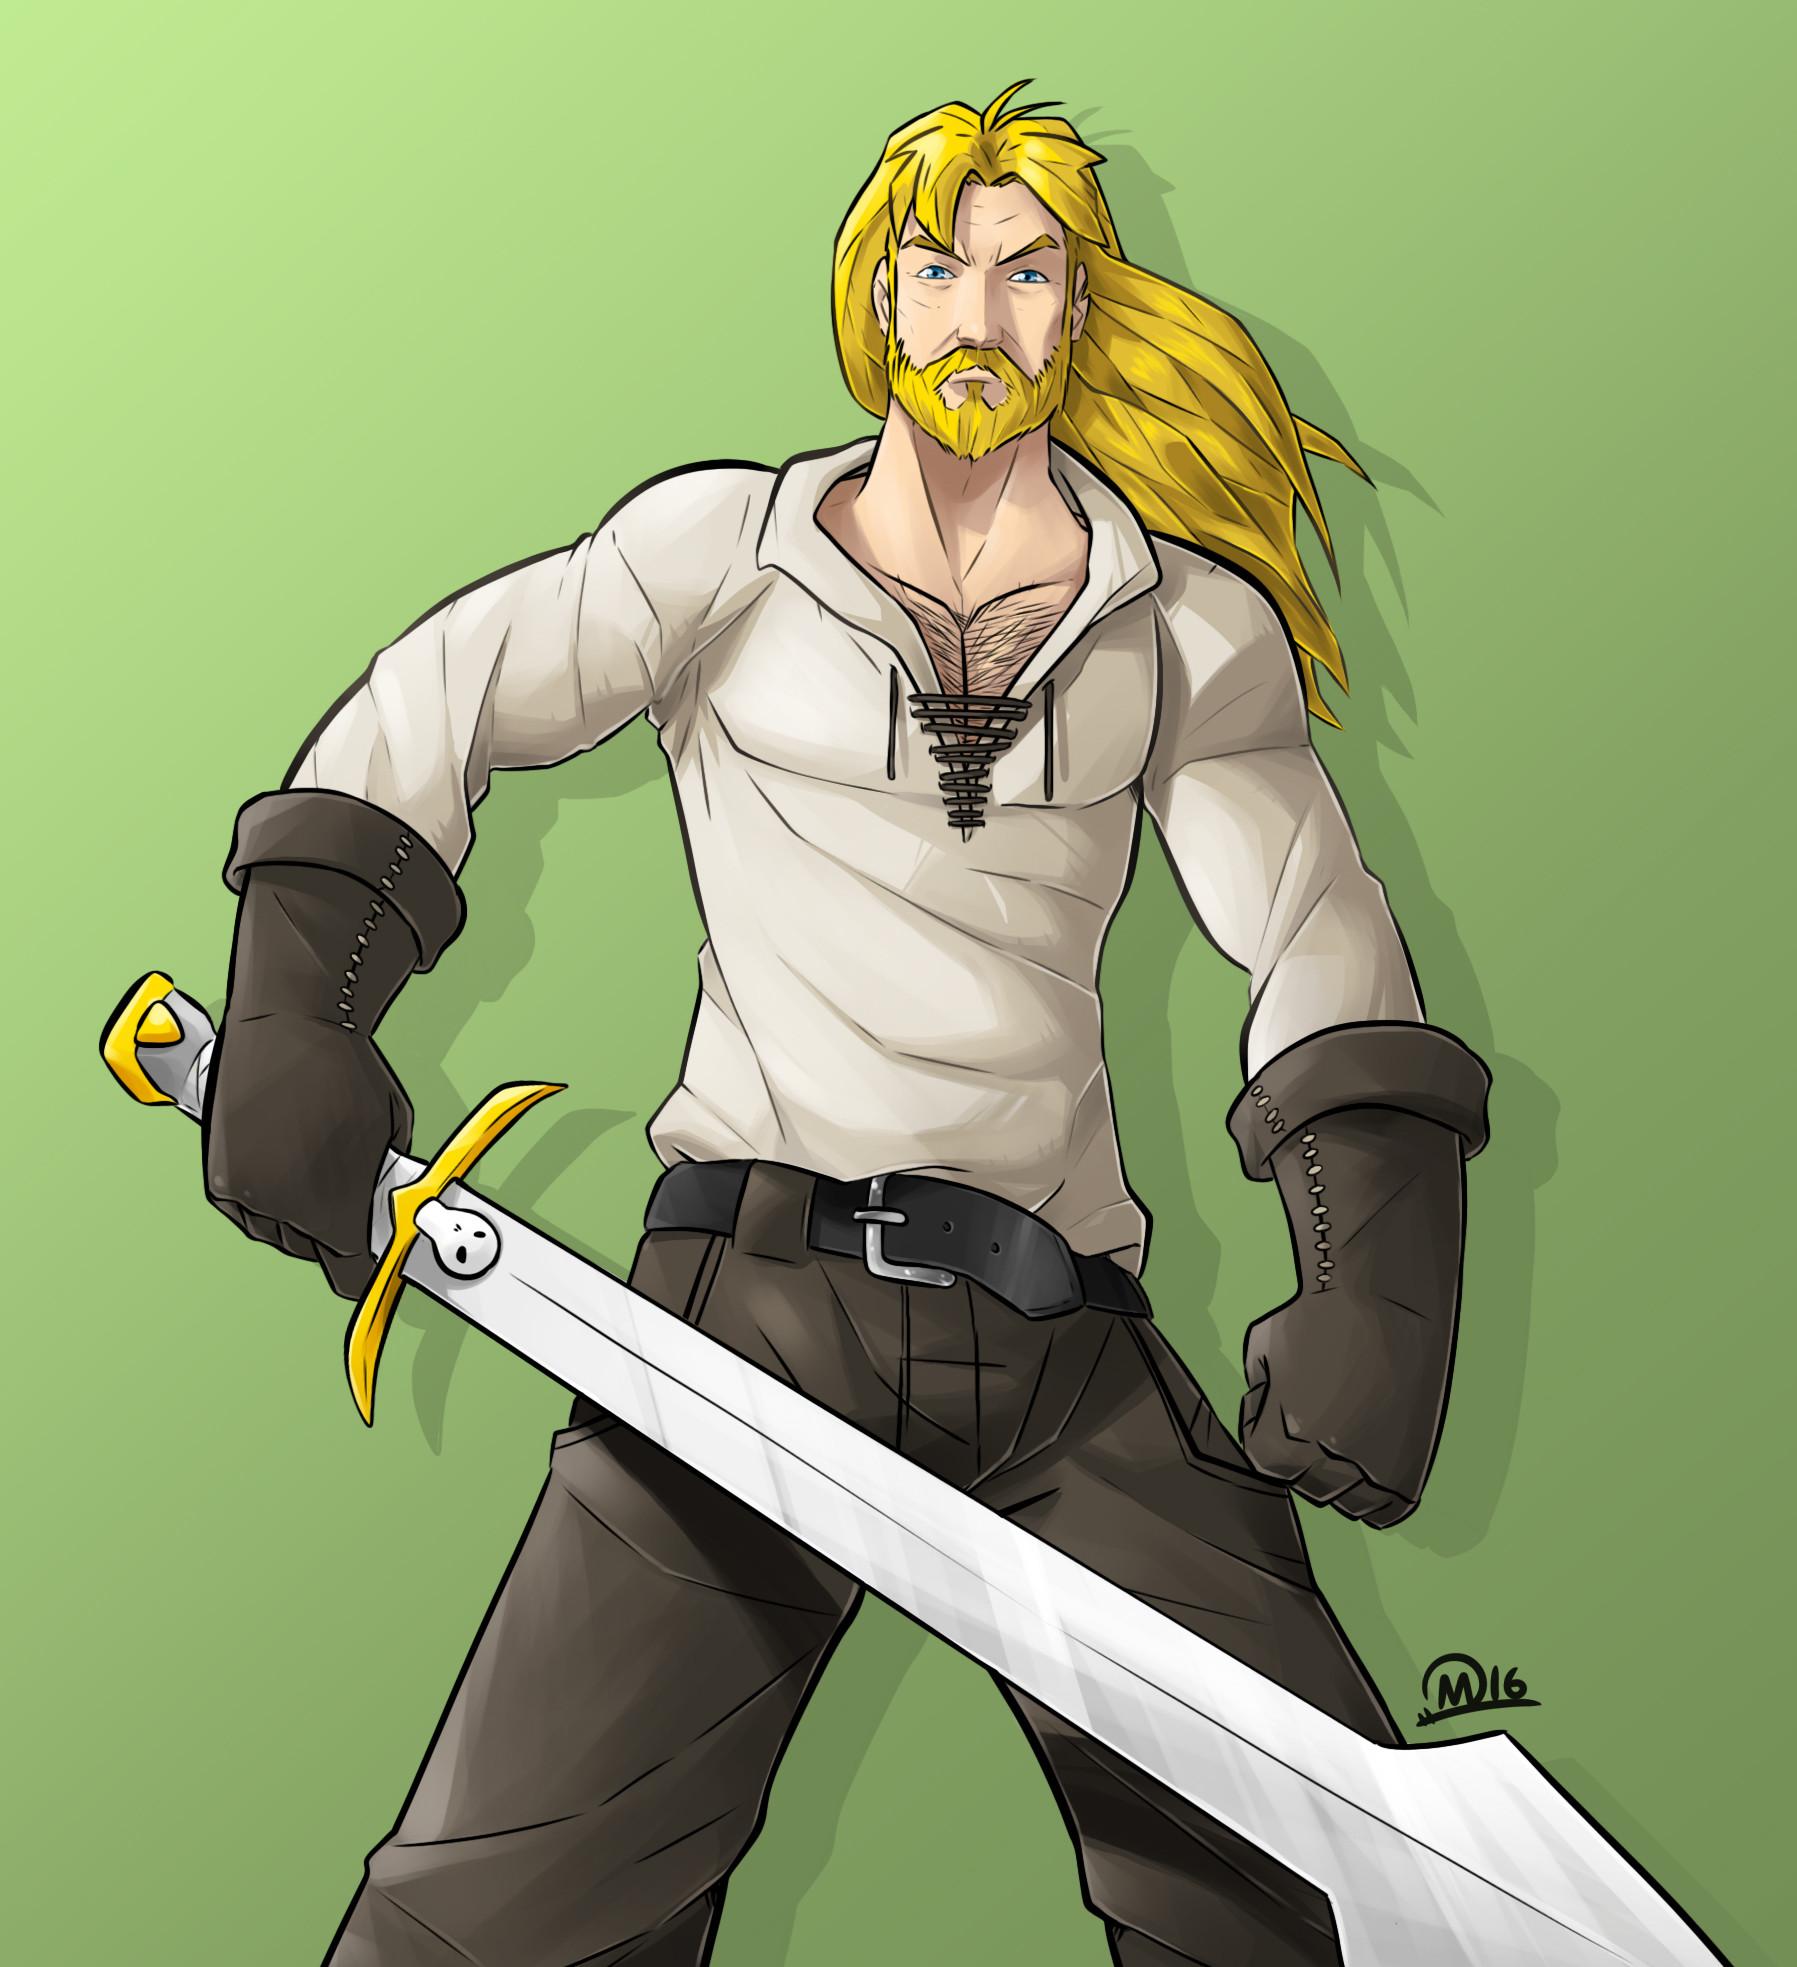 Xion mart guerrero